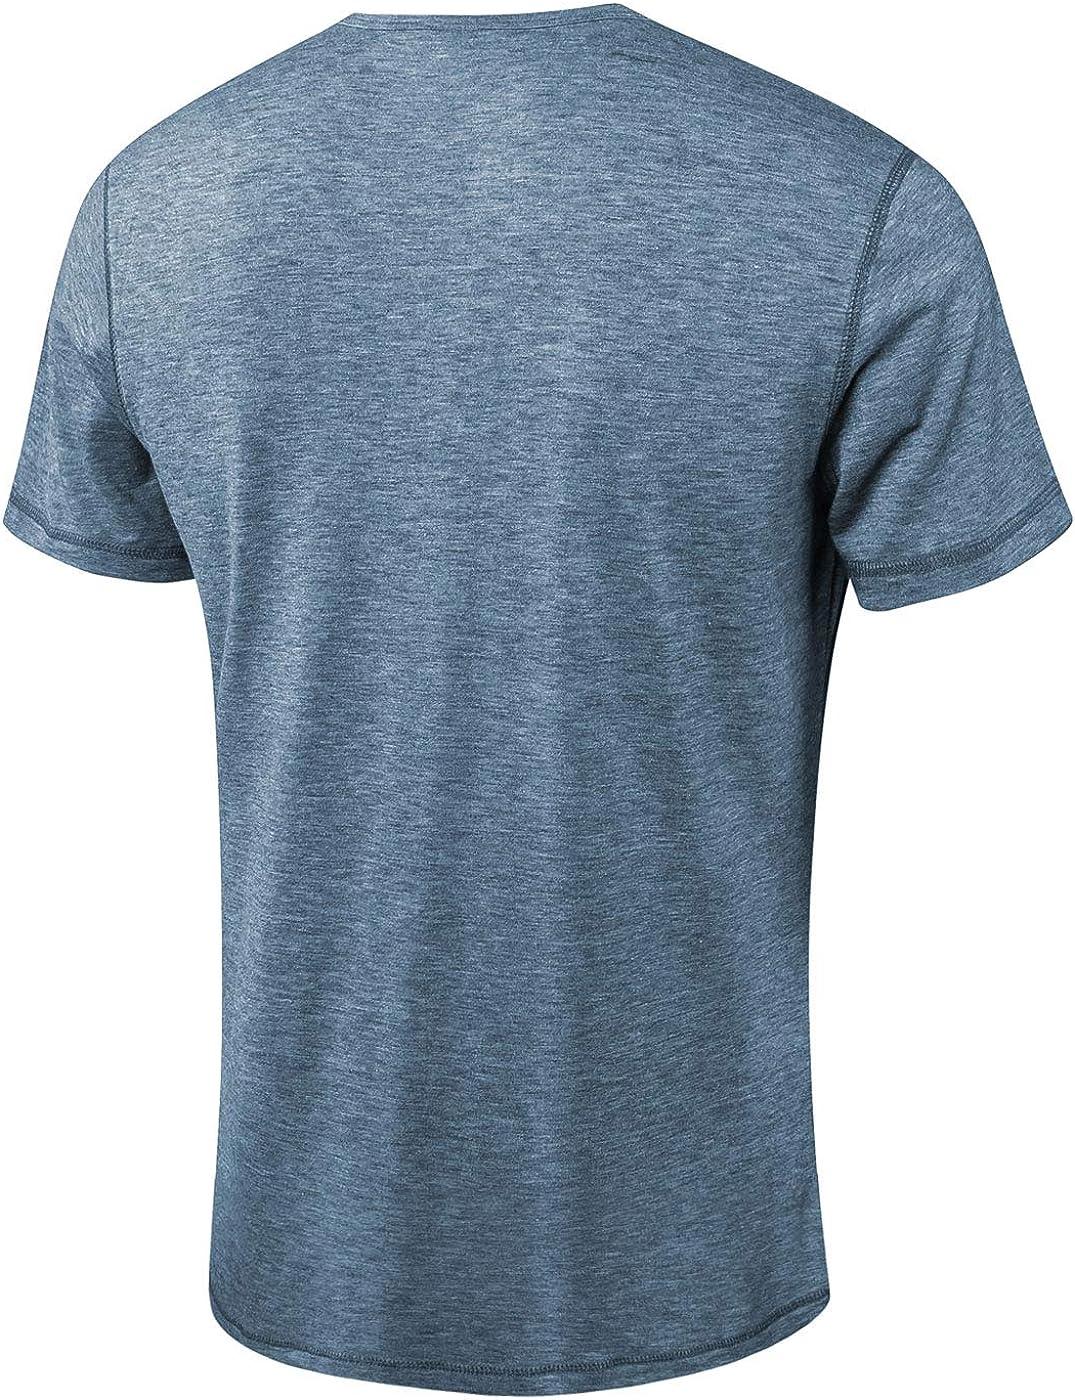 Moomphya Mens Jacquard Knitted Casual Short Sleeve V-Neck Henley T-Shirts